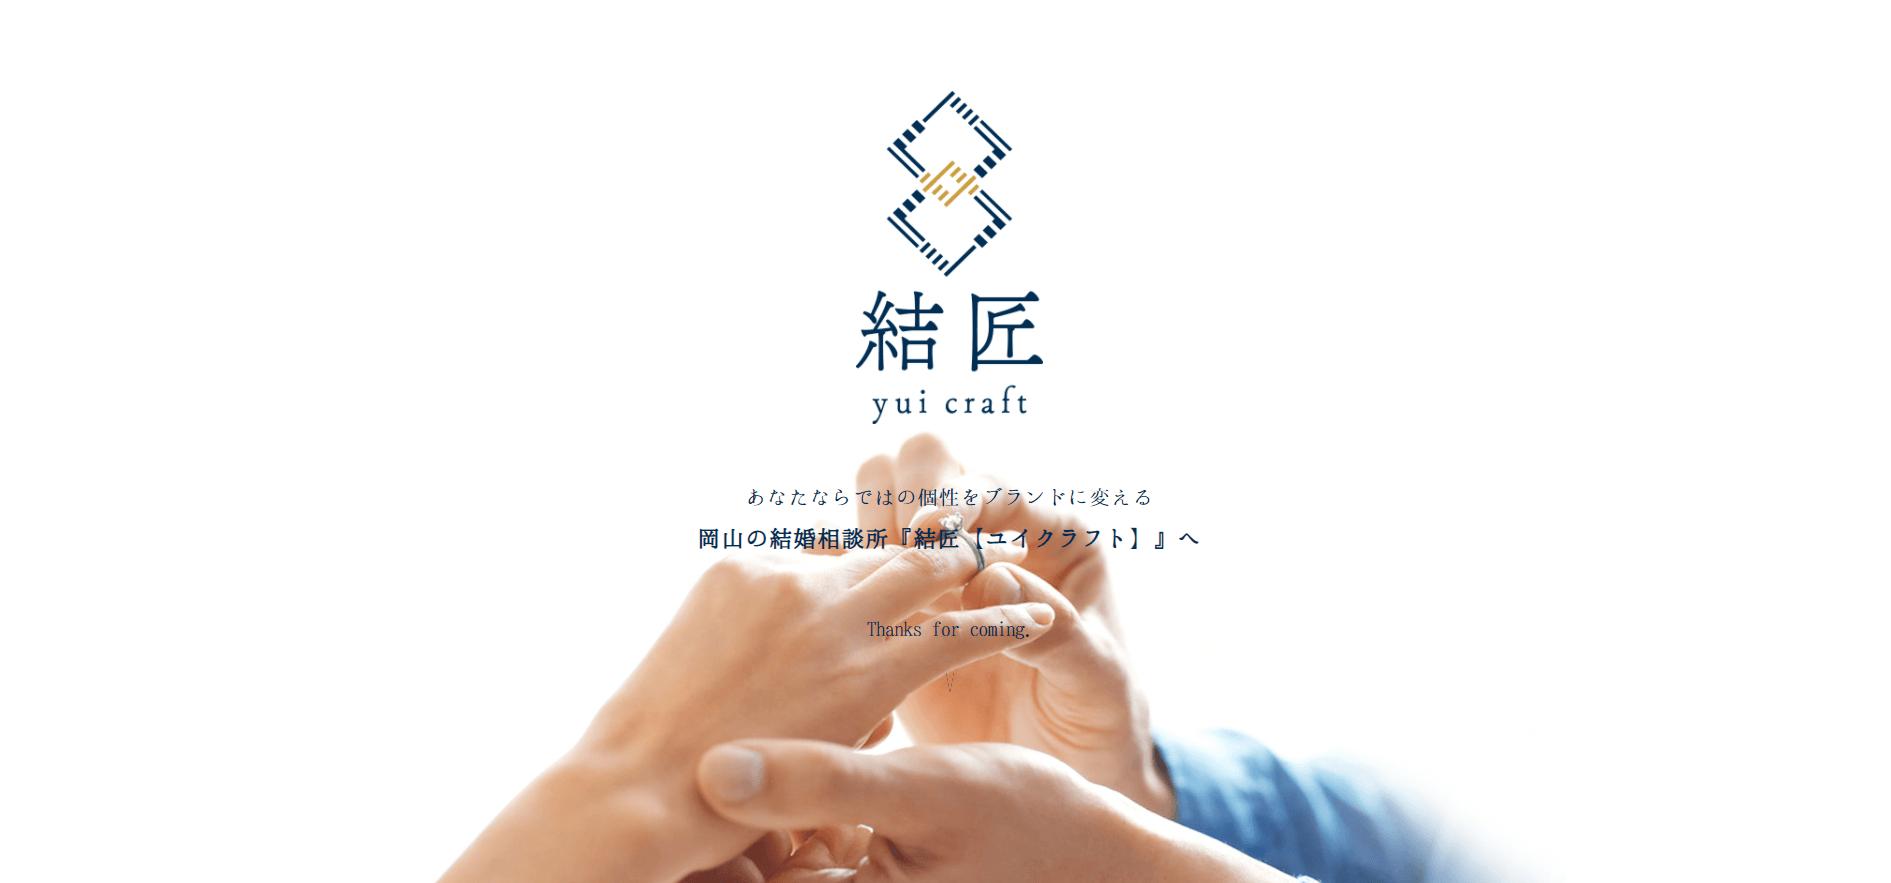 結匠 yui craft